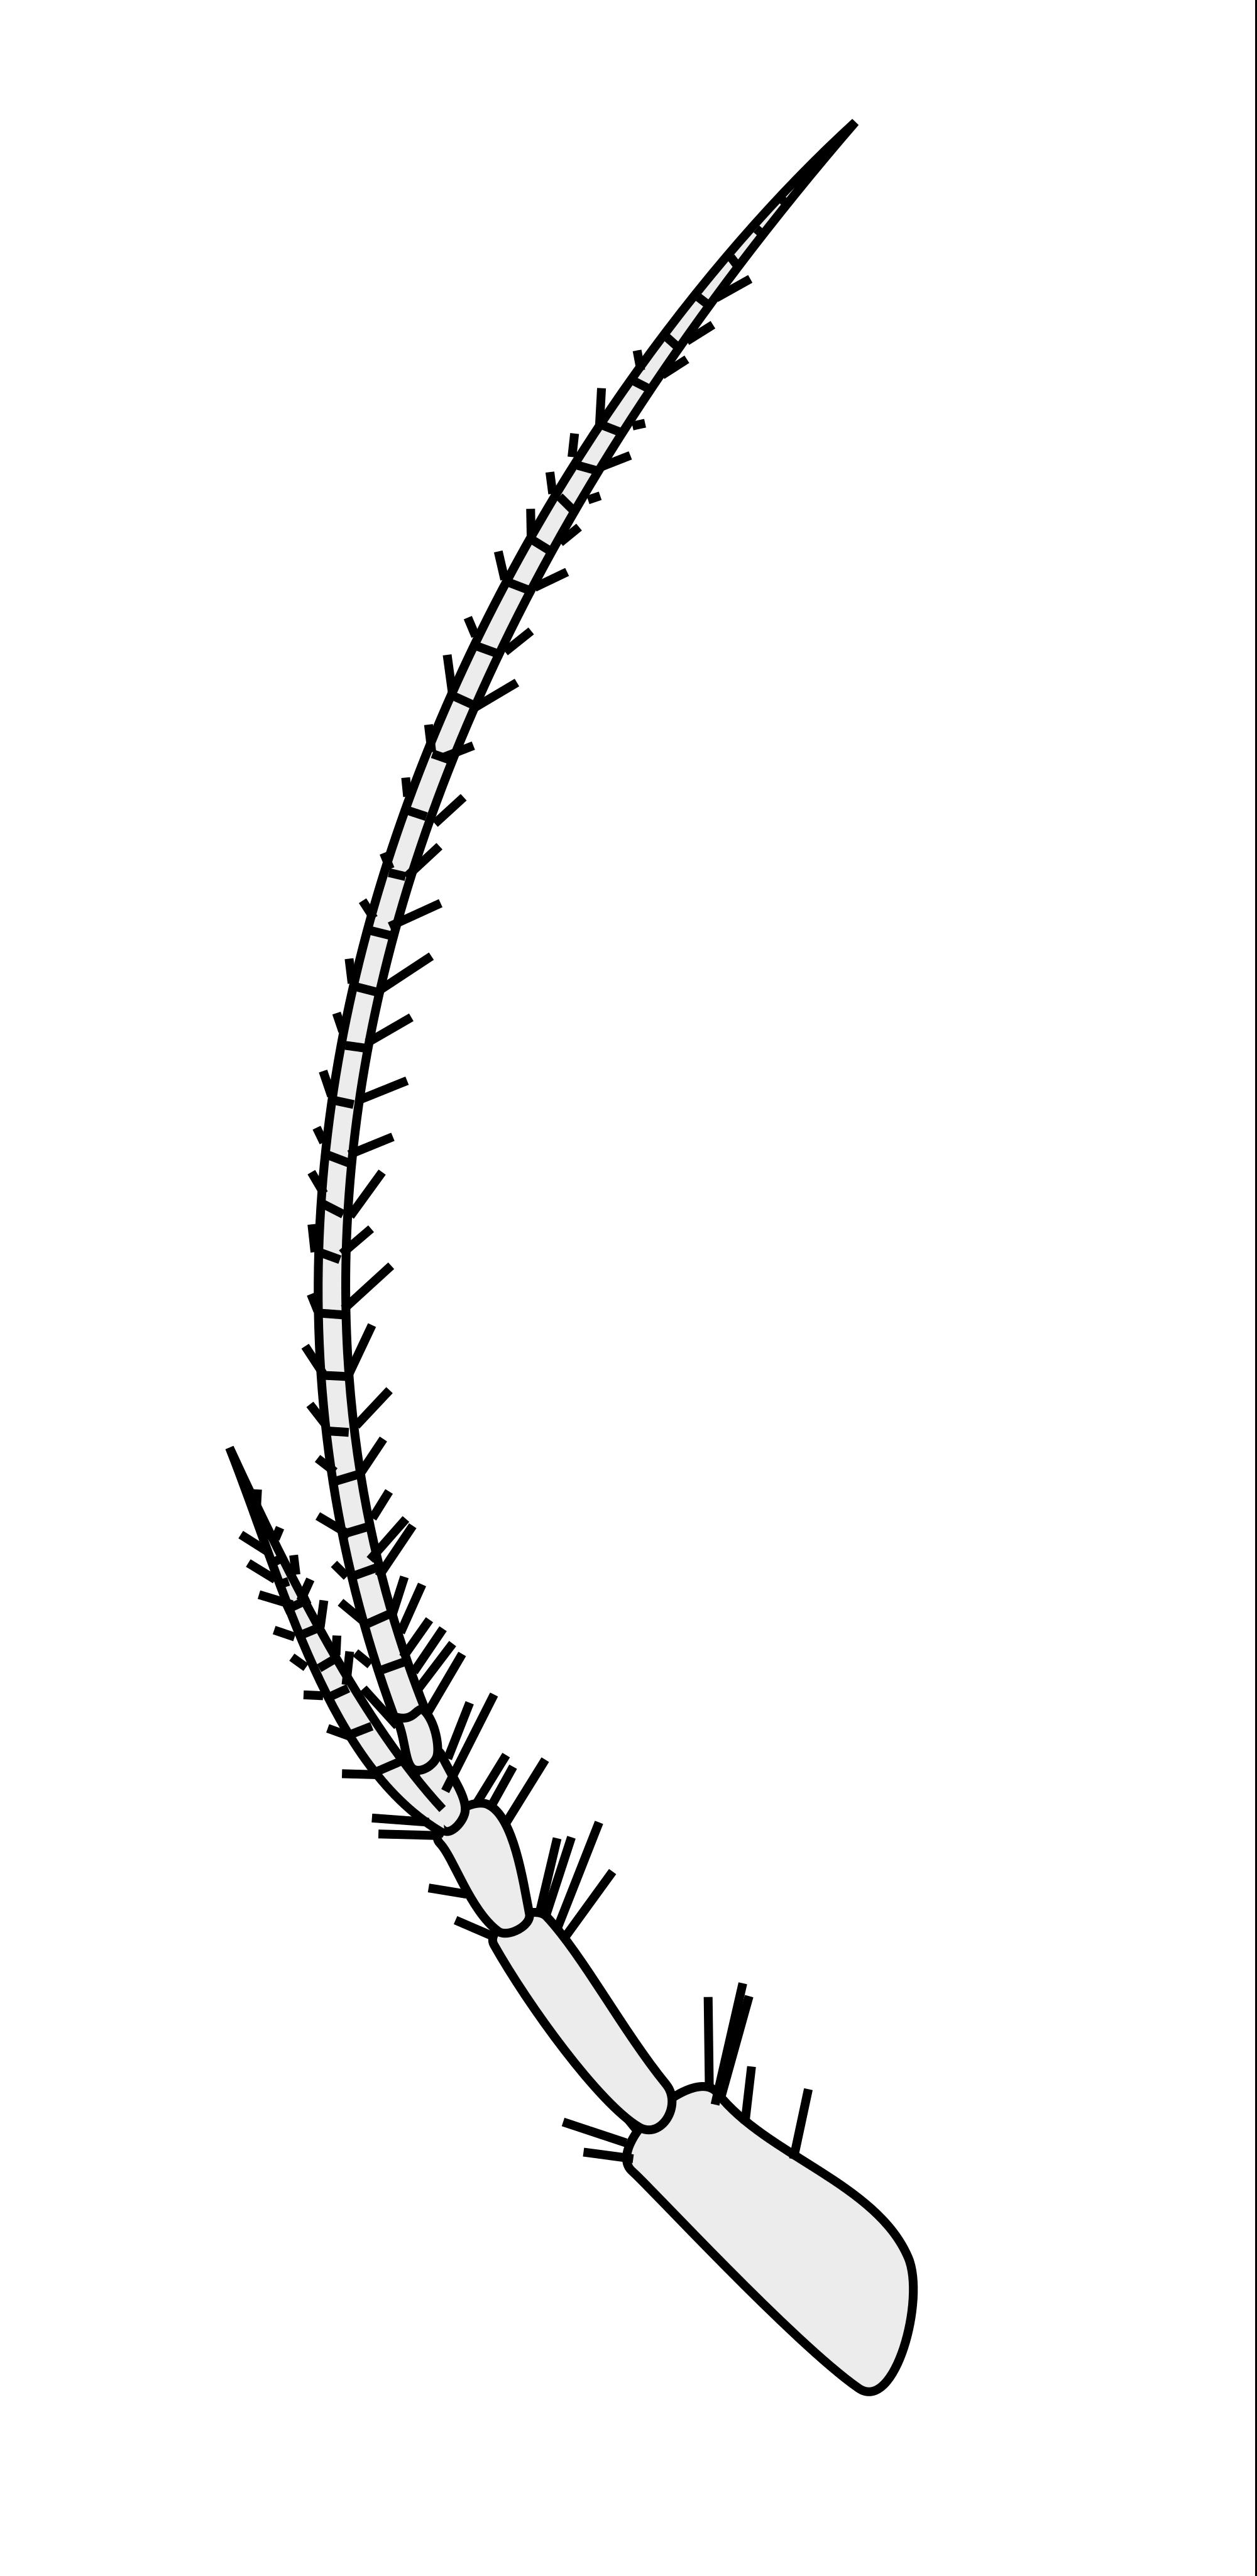 Crustacean svg #12, Download drawings